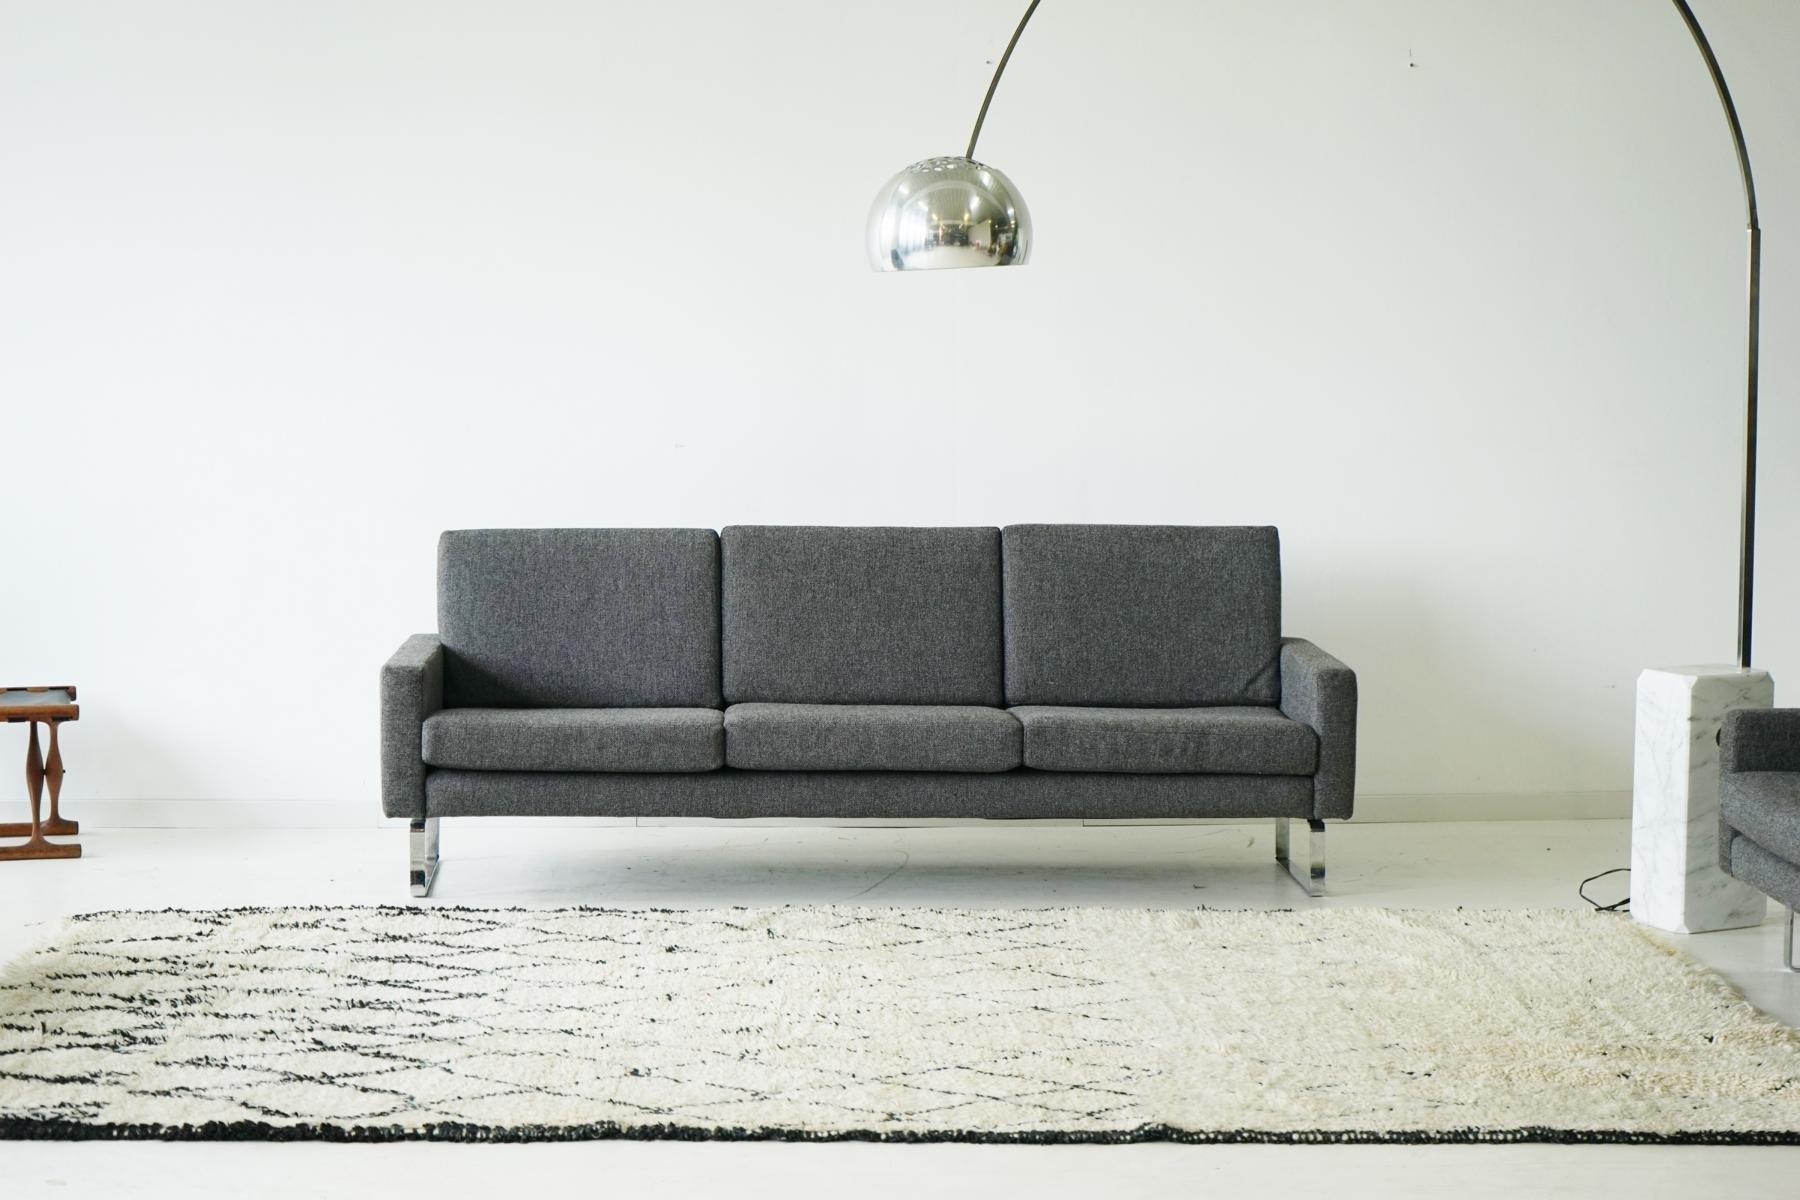 Drei sitzer sofa sessel von asko 1960er 3er set bei for Sofa sessel